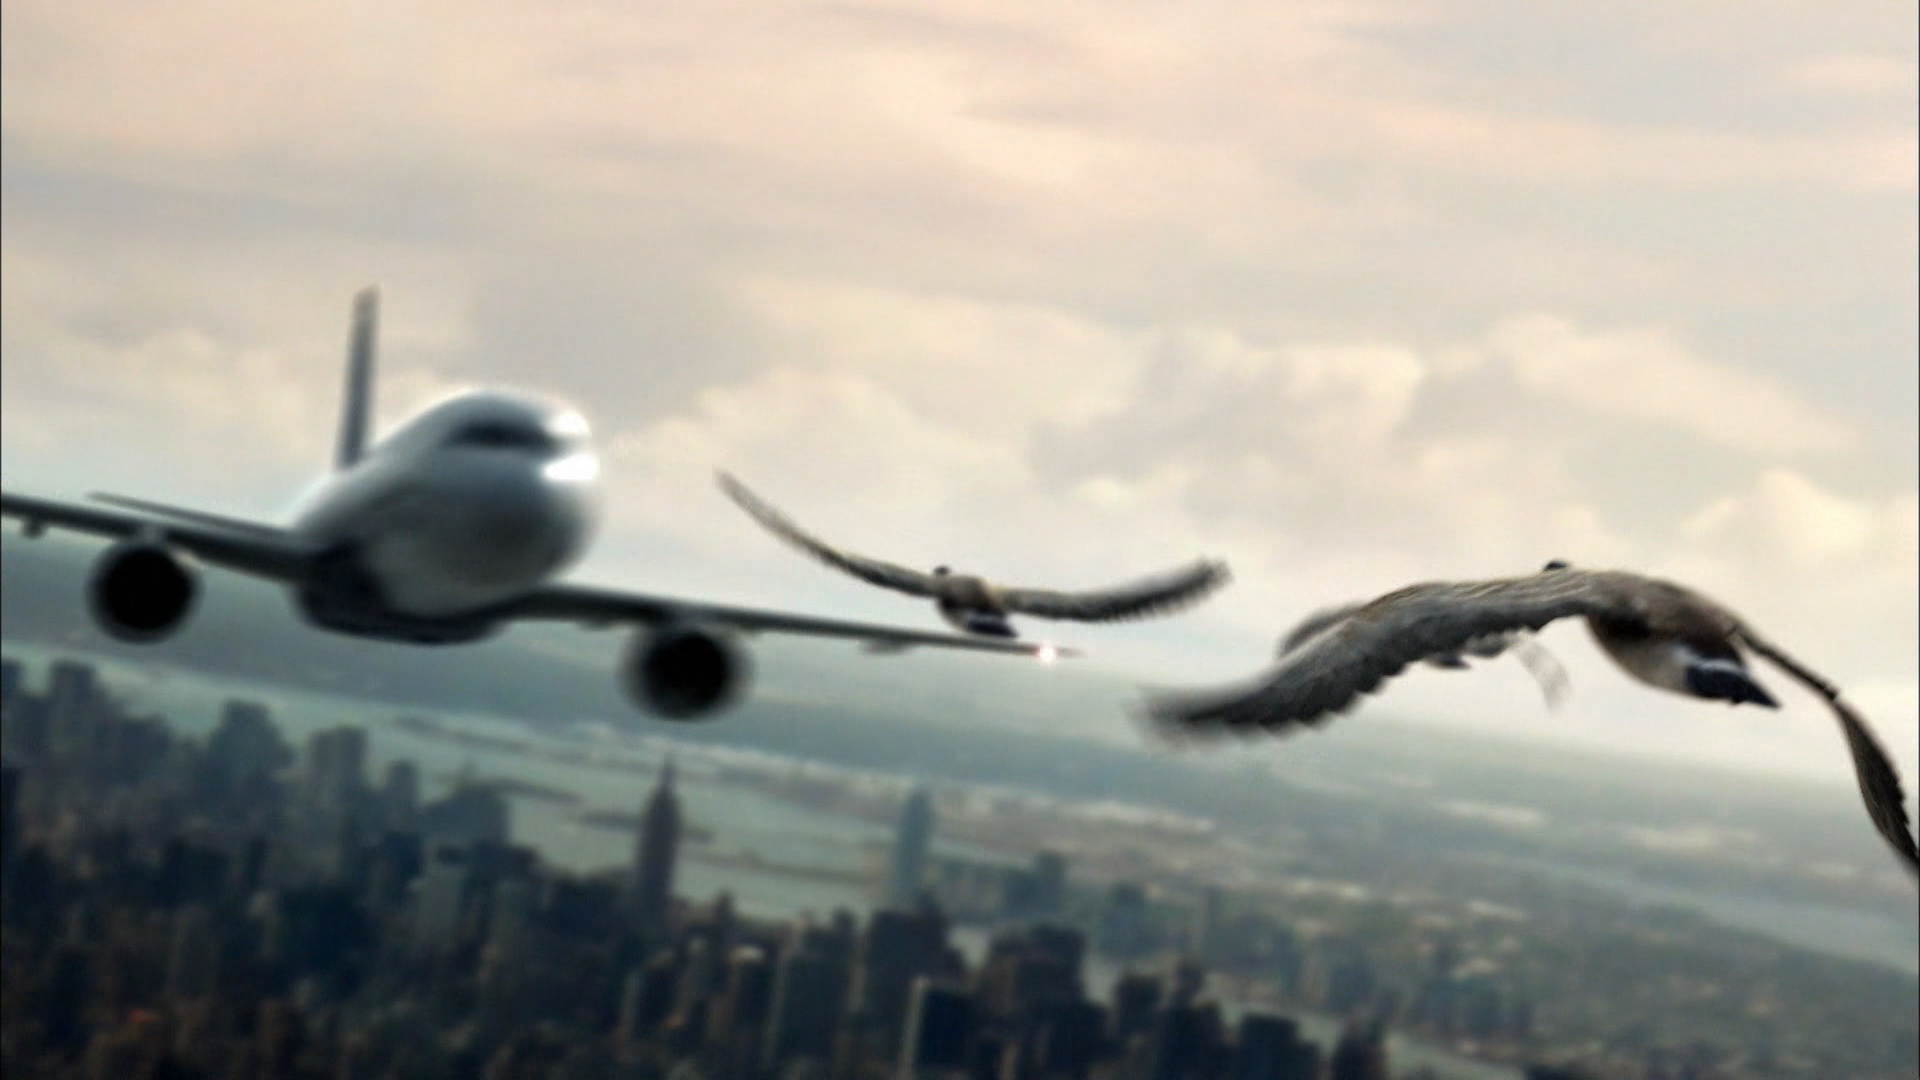 air crash investigation full episodes online free